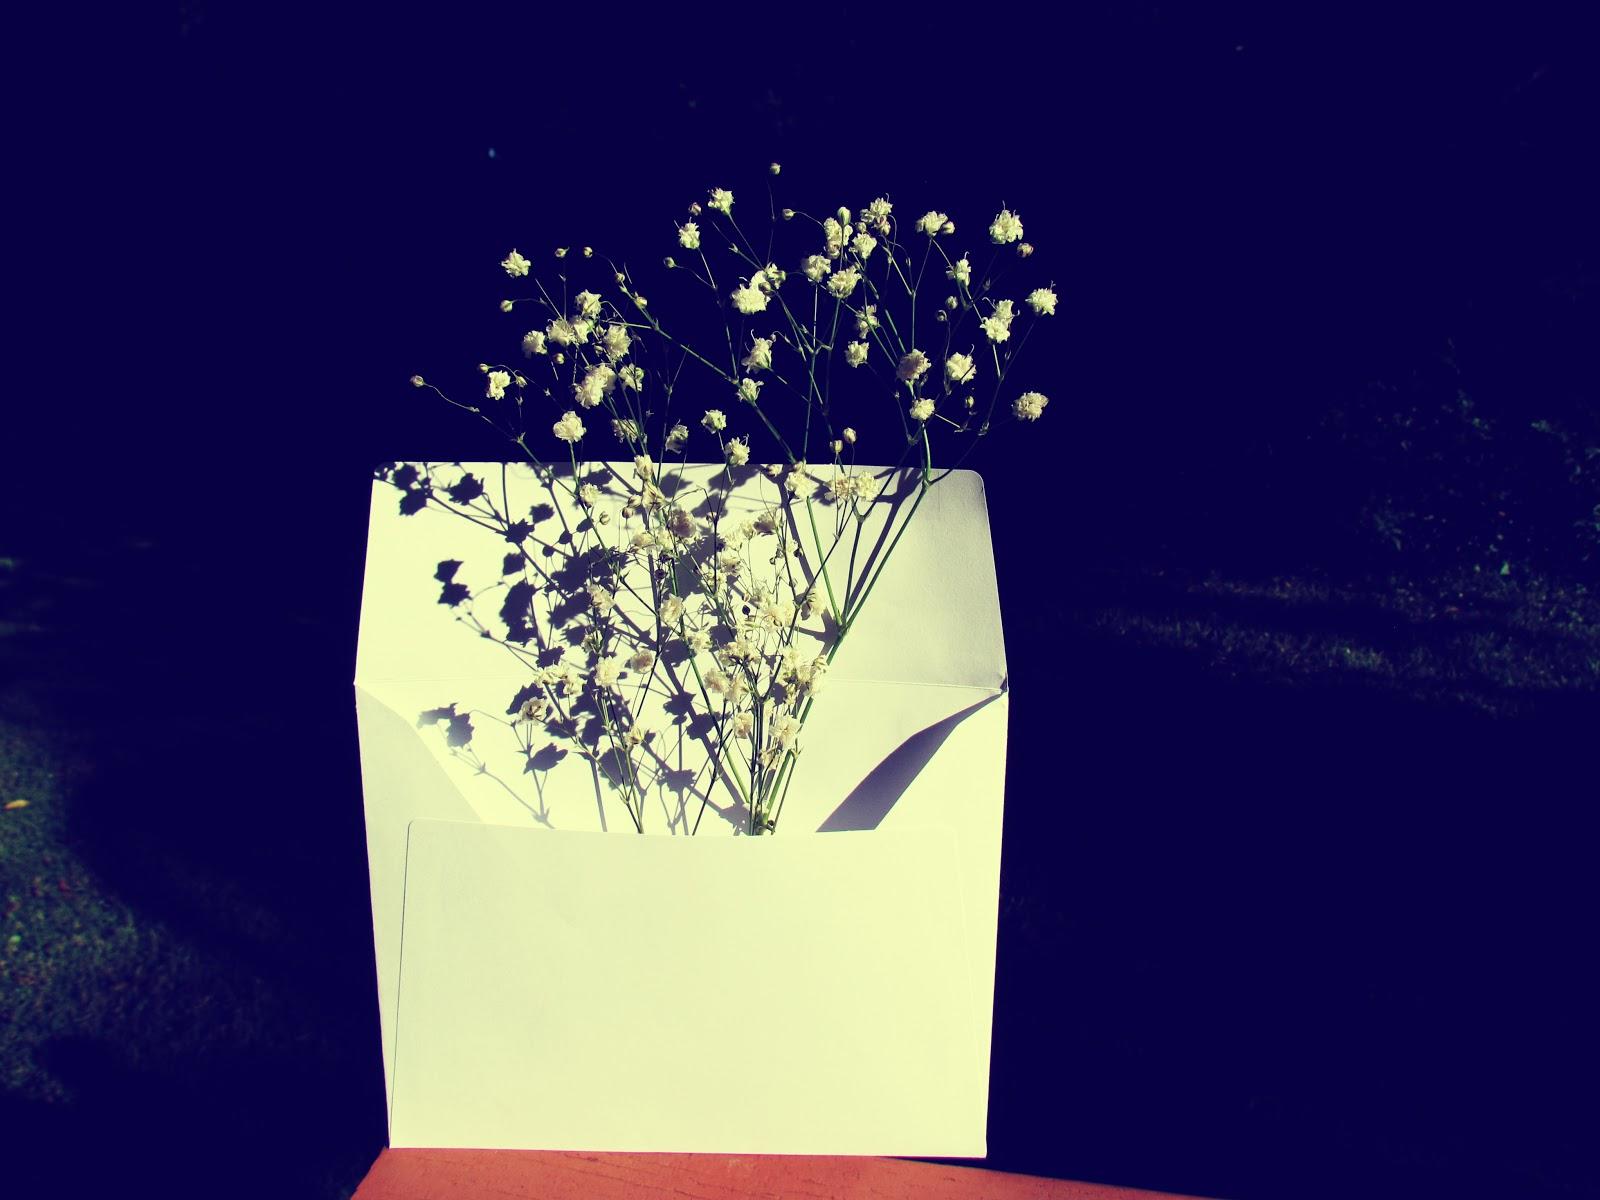 Baby breath flower, nature in an envelope, envelope spells, herbal spells, the metaphysical properties of baby's breath flower bouquet